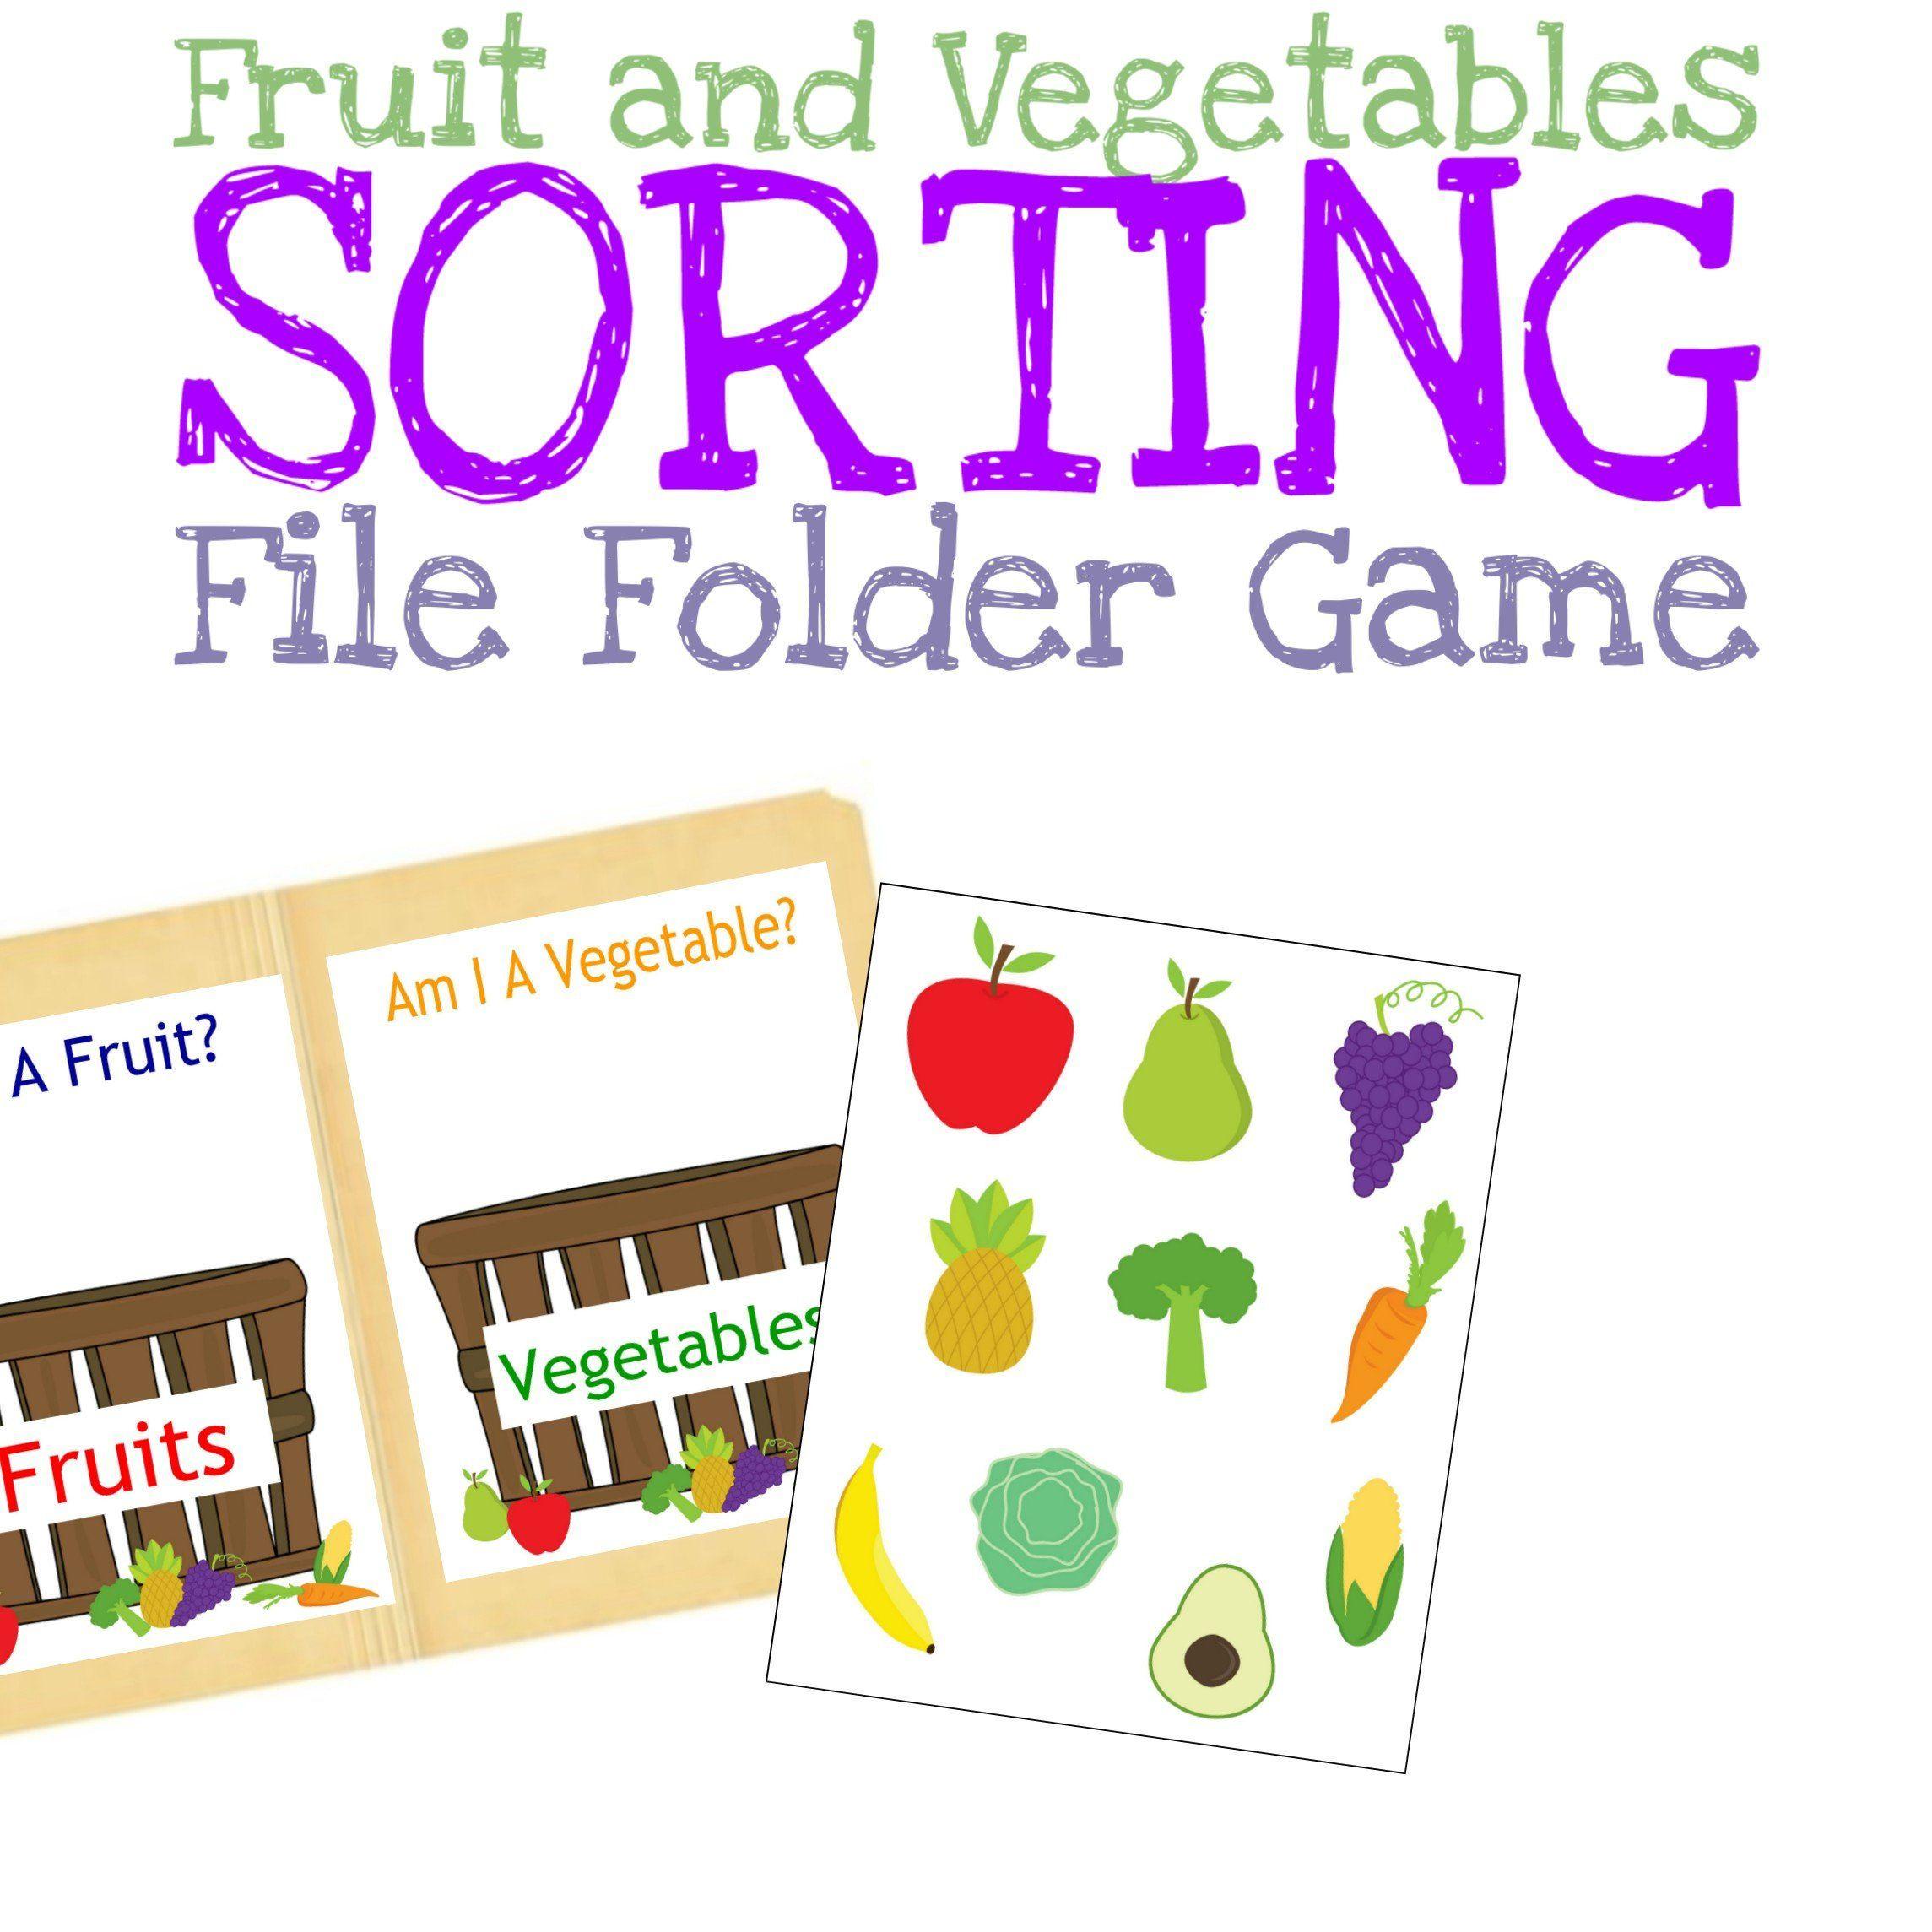 Sorting Fruits And Vegetables File Folder Game Preschool